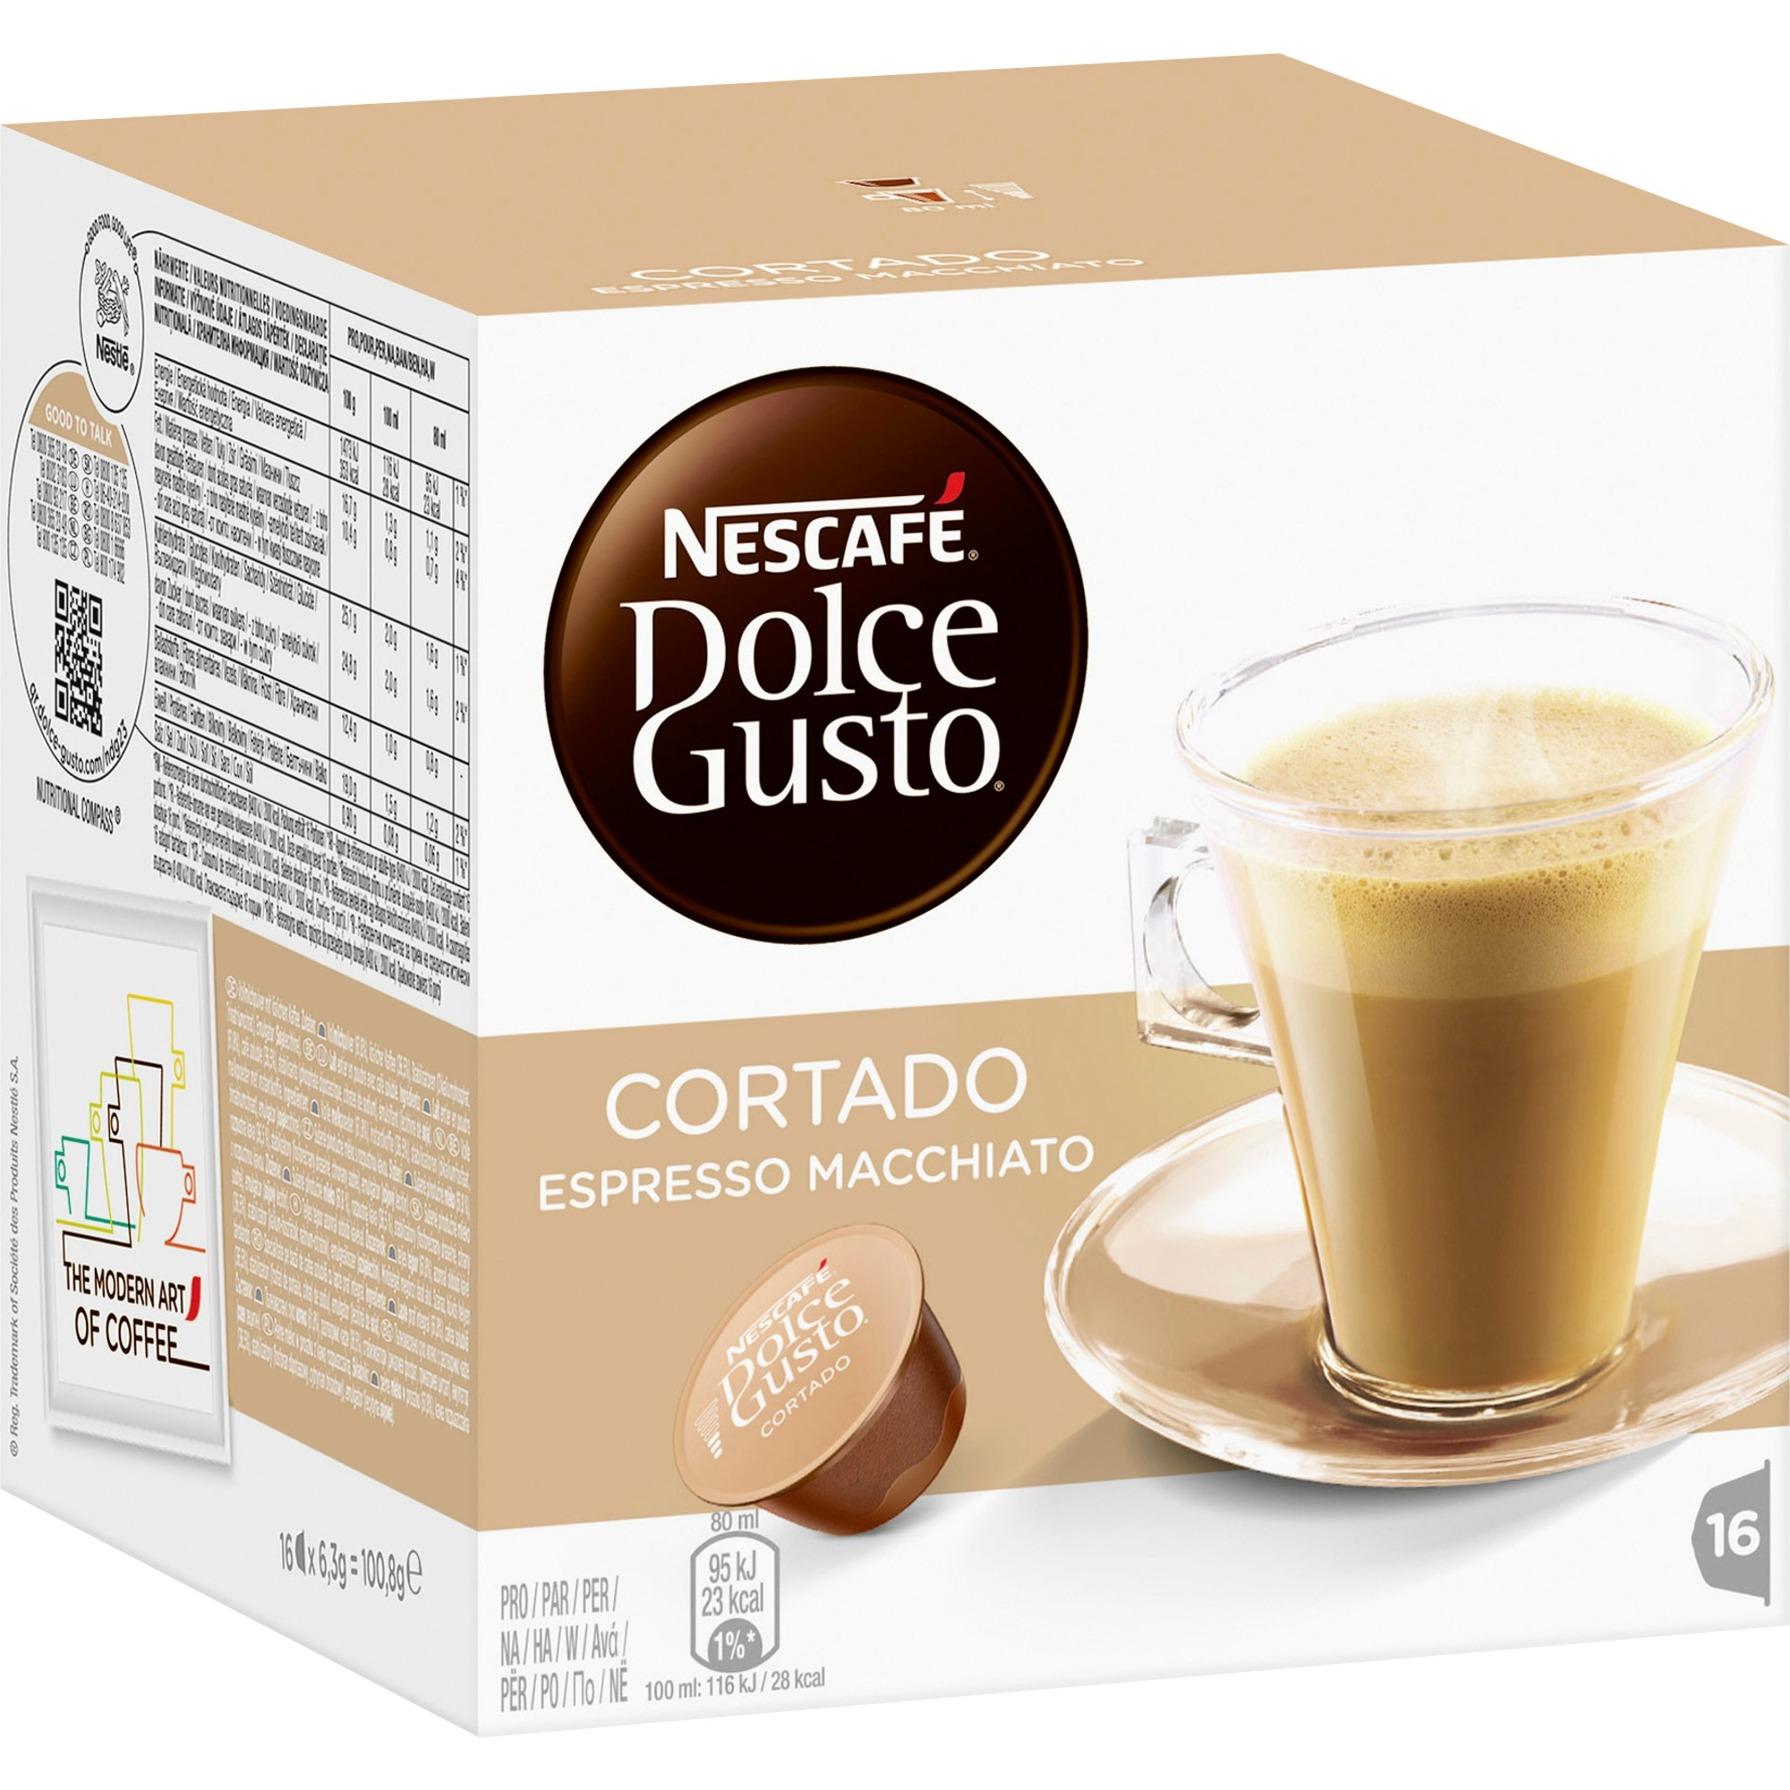 Dolce Gusto Cortado café instantáneo, Cápsula de bebida